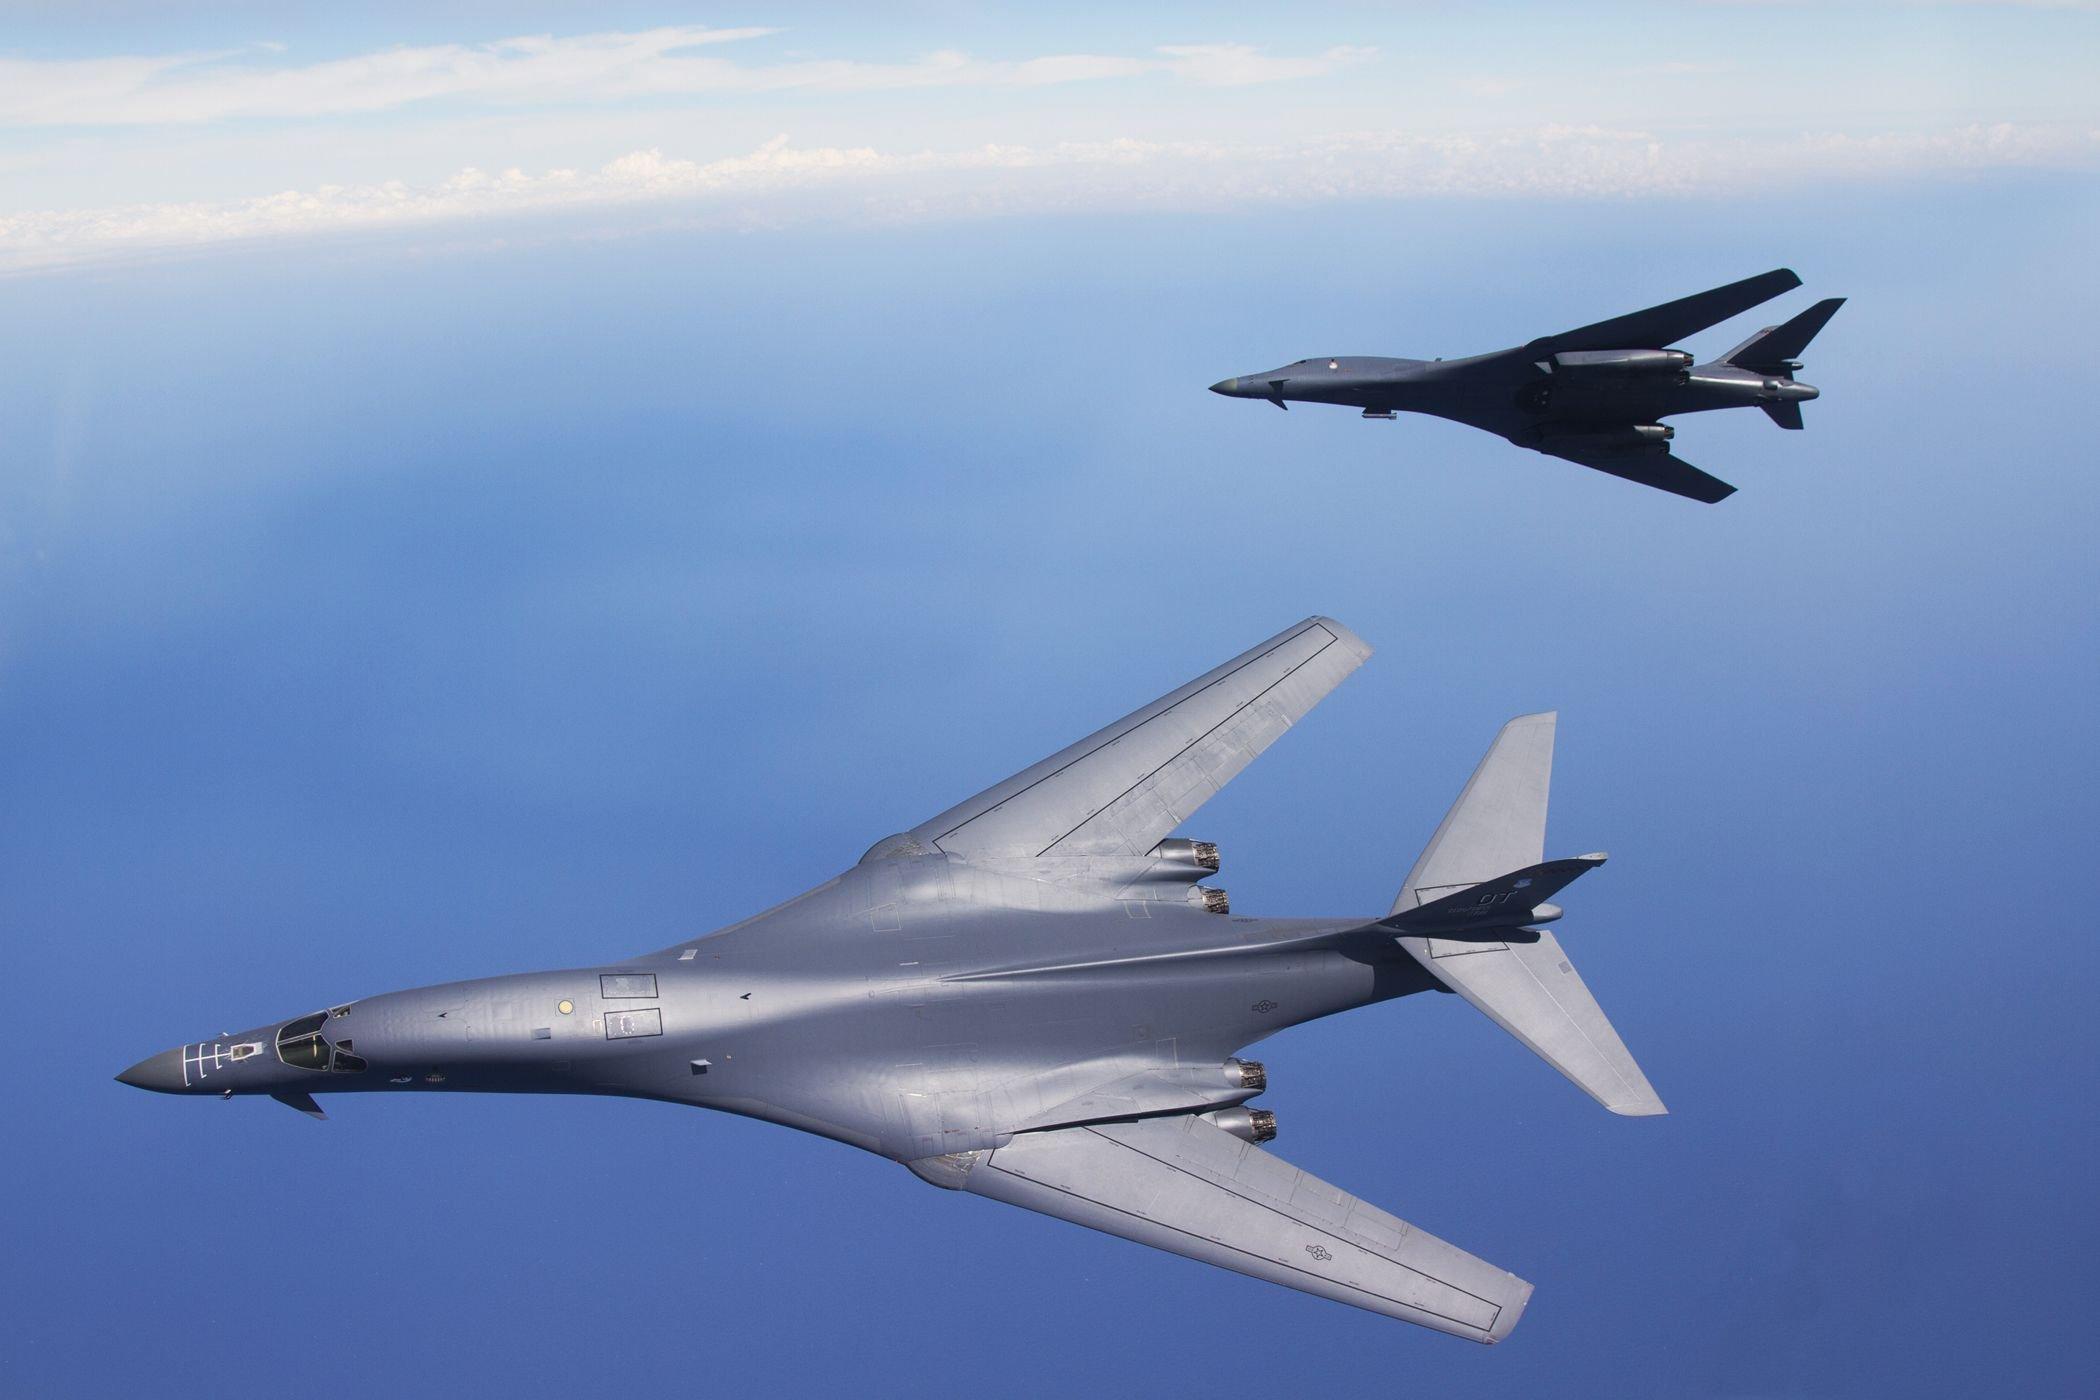 Rockwell B-1 Lancer bomber USA army aircrafts jet ... B1 Lancer Supersonic